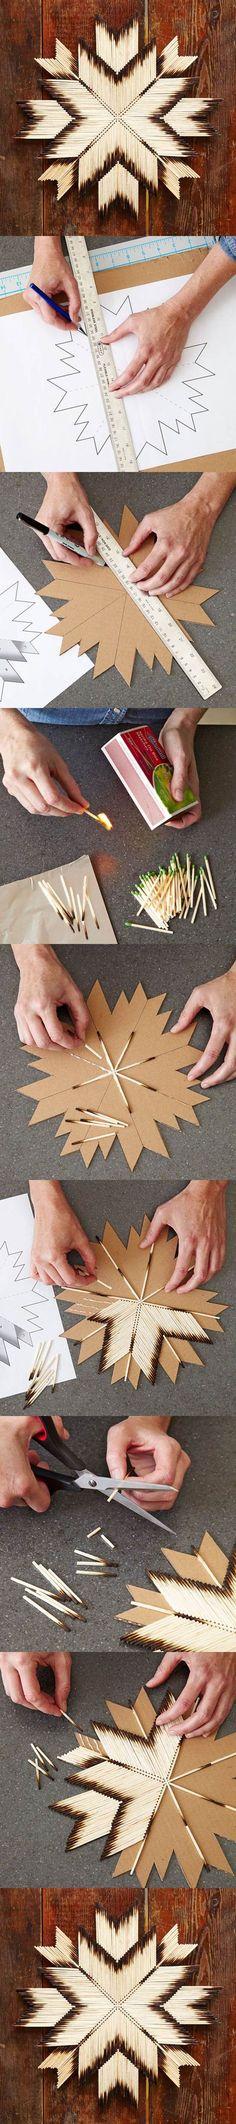 DIY Unique Crafts of Matches | iCreativeIdeas.com Like Us on Facebook ==> https://www.facebook.com/icreativeideas